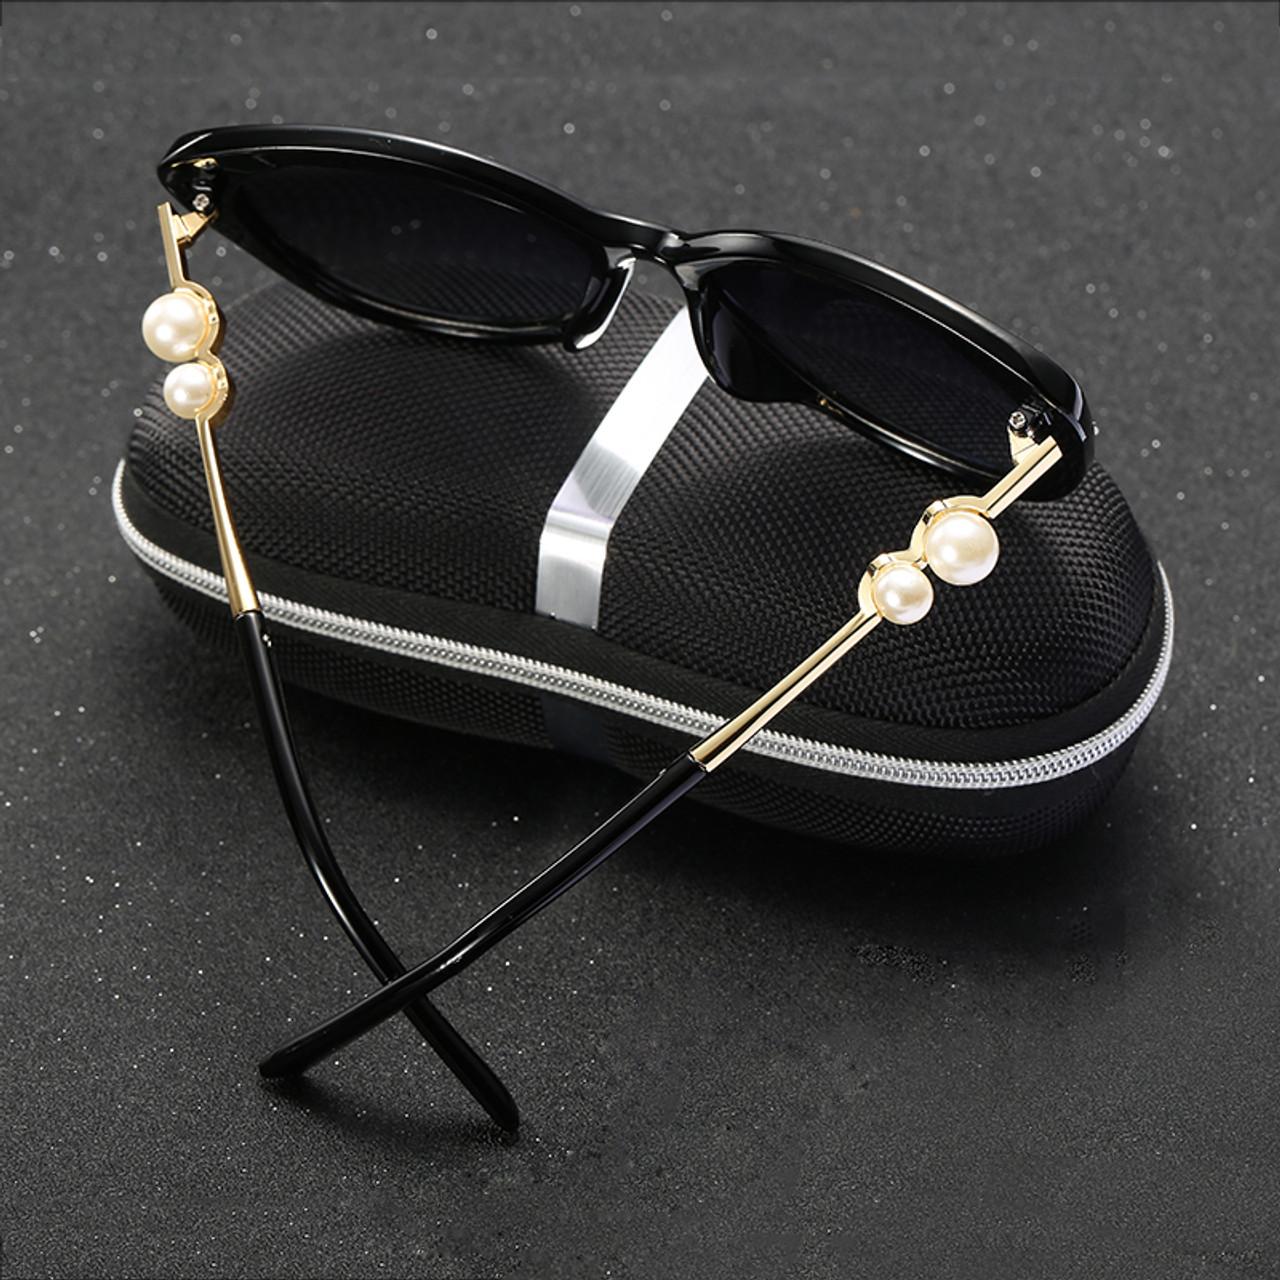 9e72dc3f0d9 ... 2017 HDCRAFTER Fashion Pearl Polarized Sunglasses Women Luxury Lady  Brand Designer Sun Glasses Vintage Elegant Eyewear ...